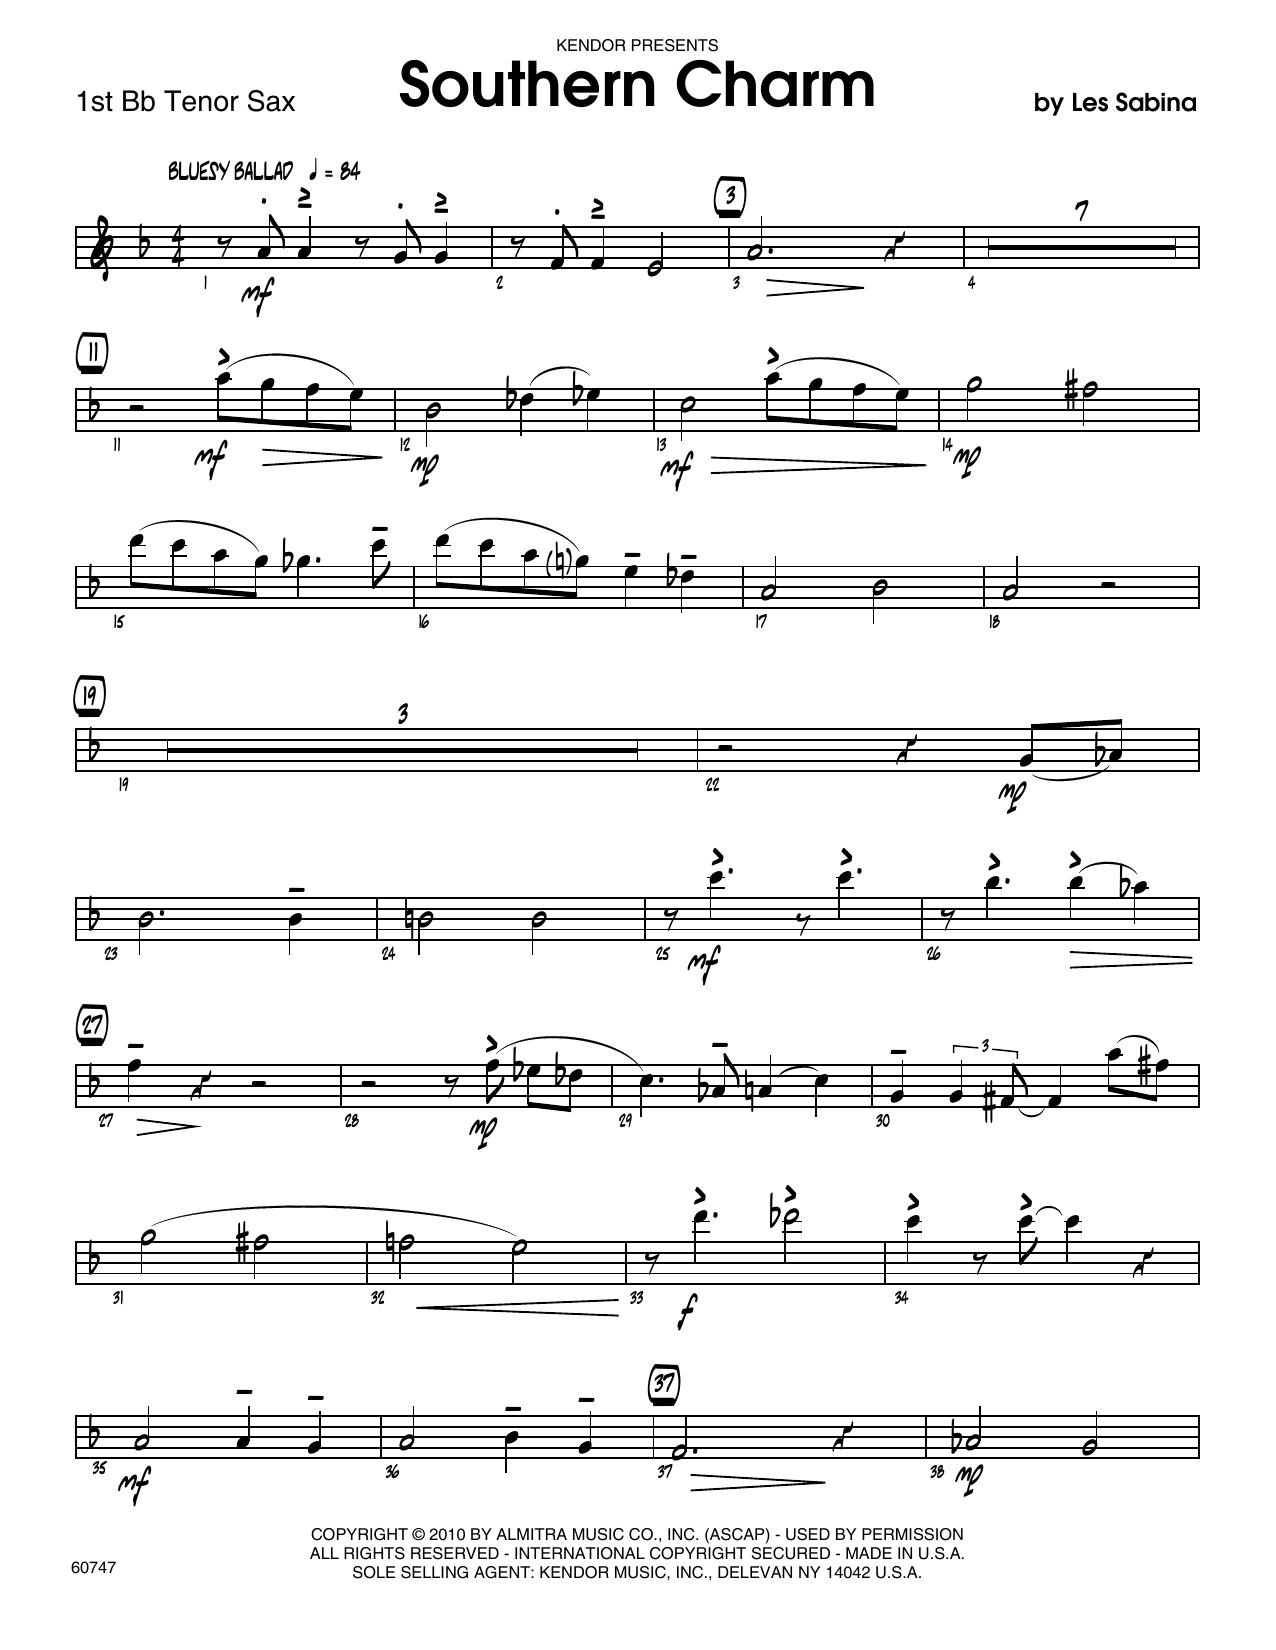 Southern Charm - 1st Tenor Saxophone Sheet Music